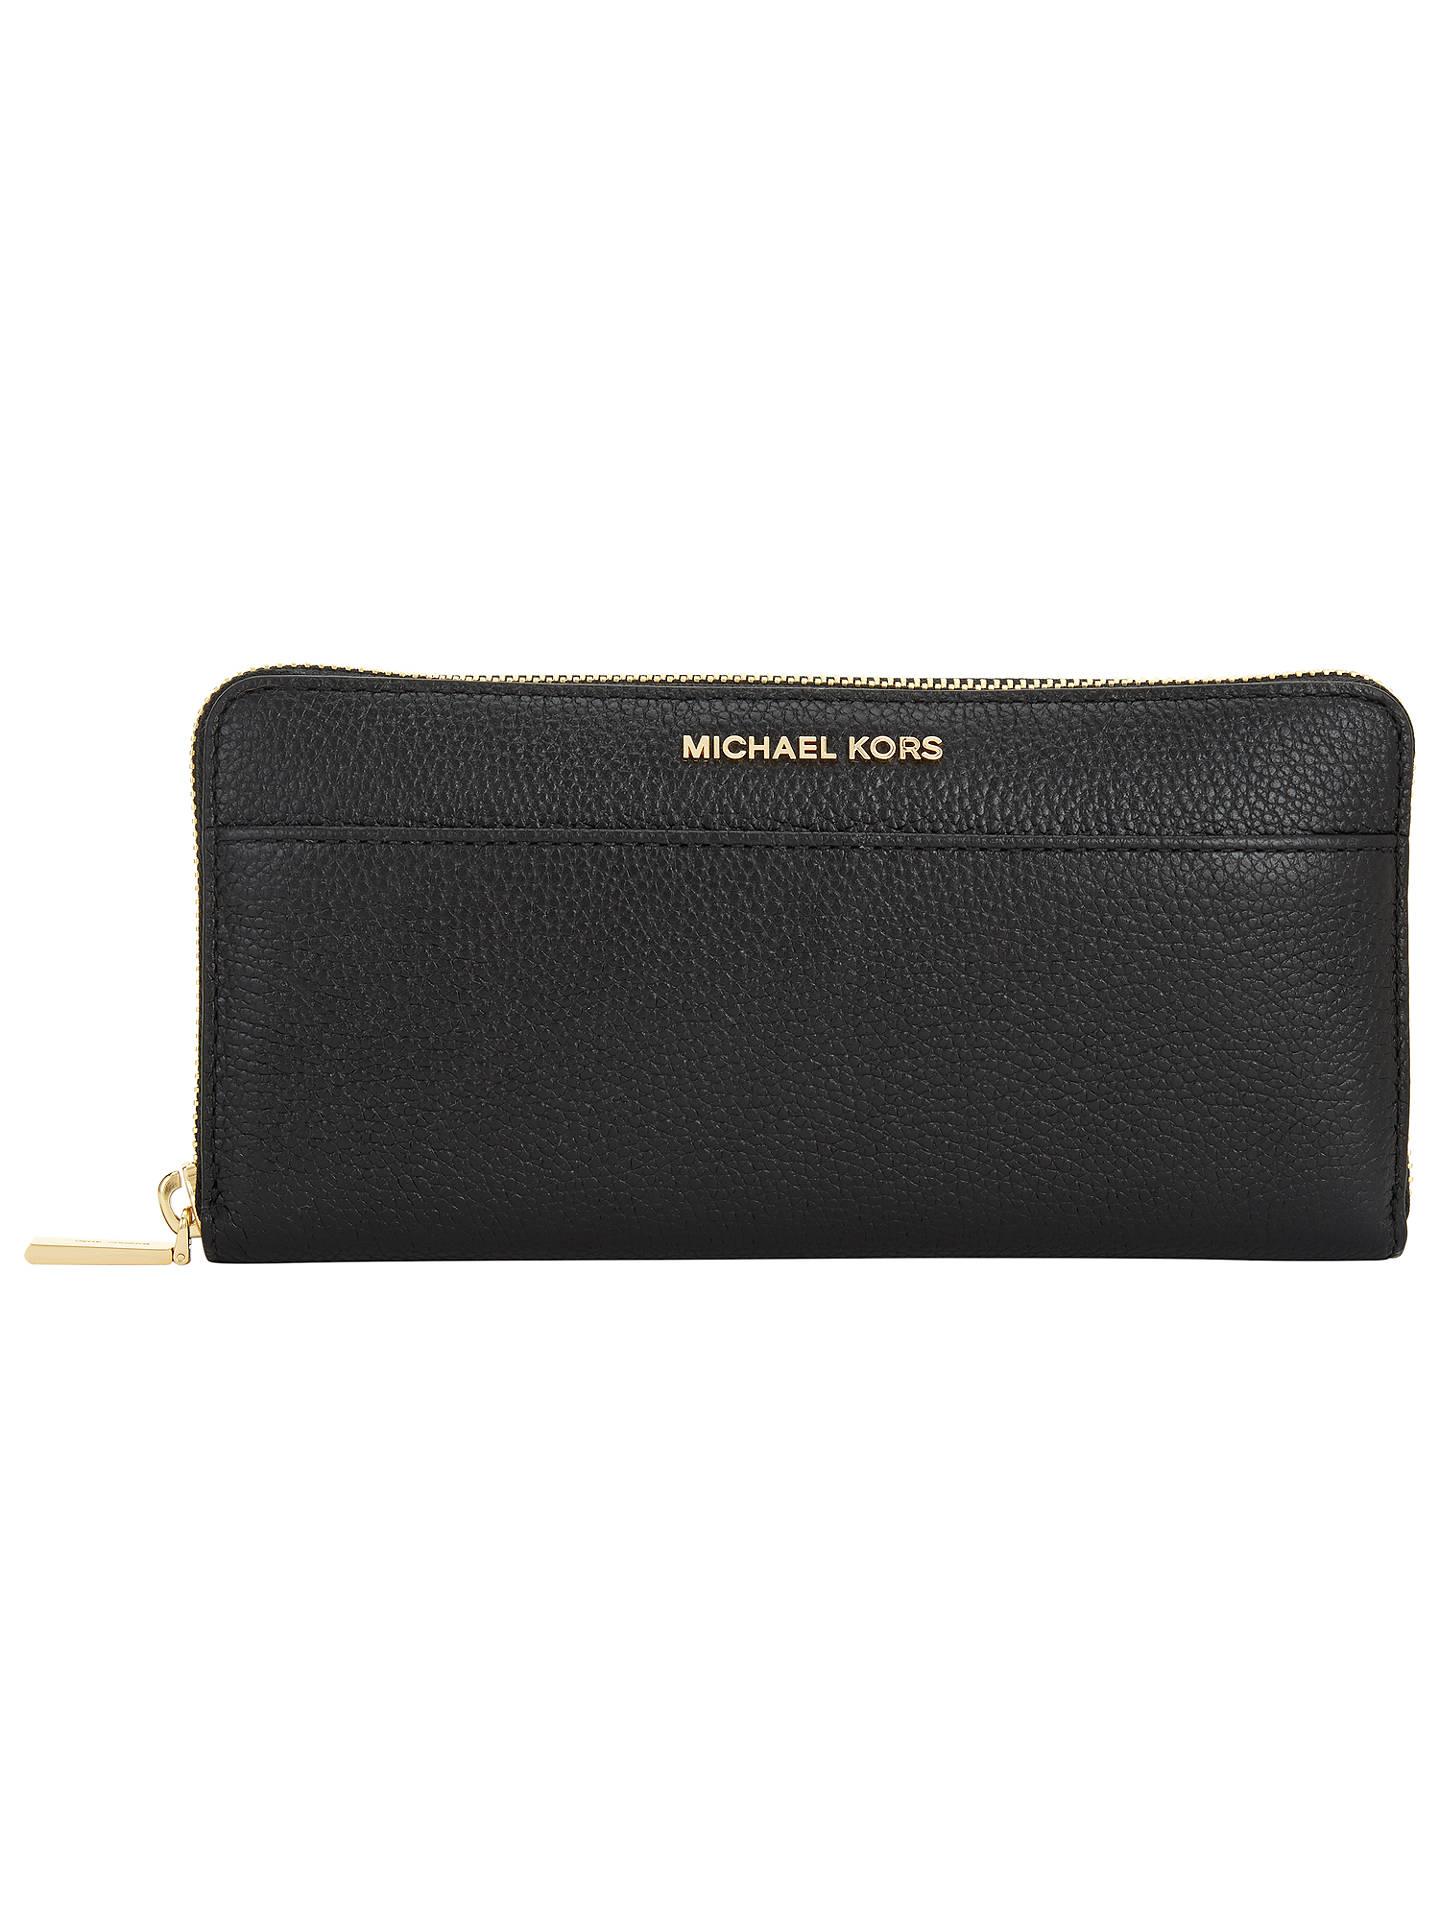 04cd7b0cde18e MICHAEL Michael Kors Mercer Leather Zip Around Continental Purse ...